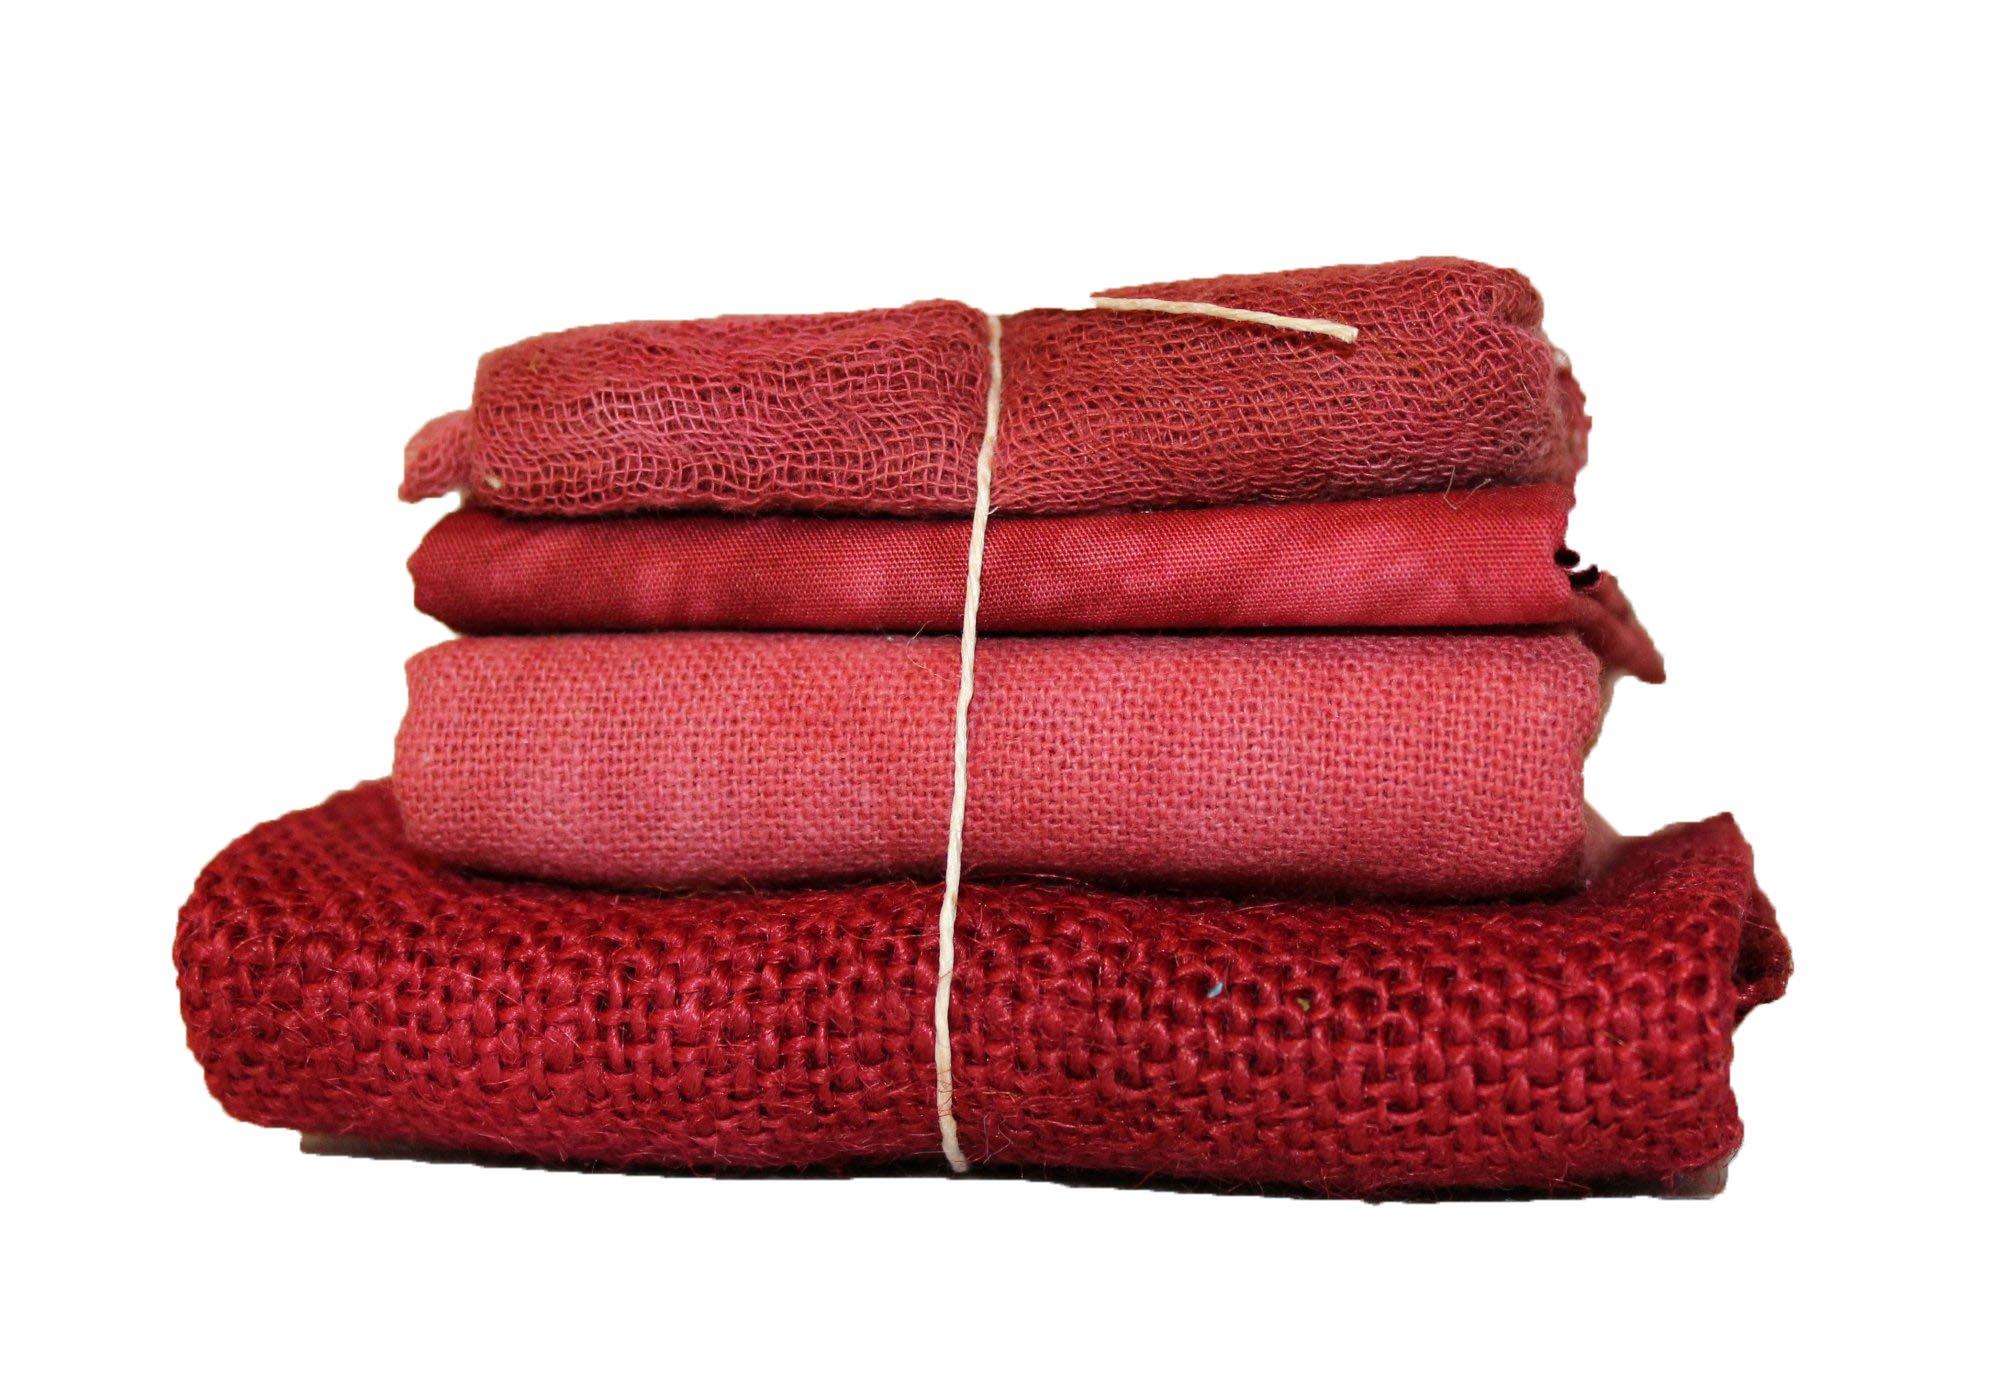 Tuscan Bindle - Cheesecloth, Cotton, Osnaburg, & Burlap